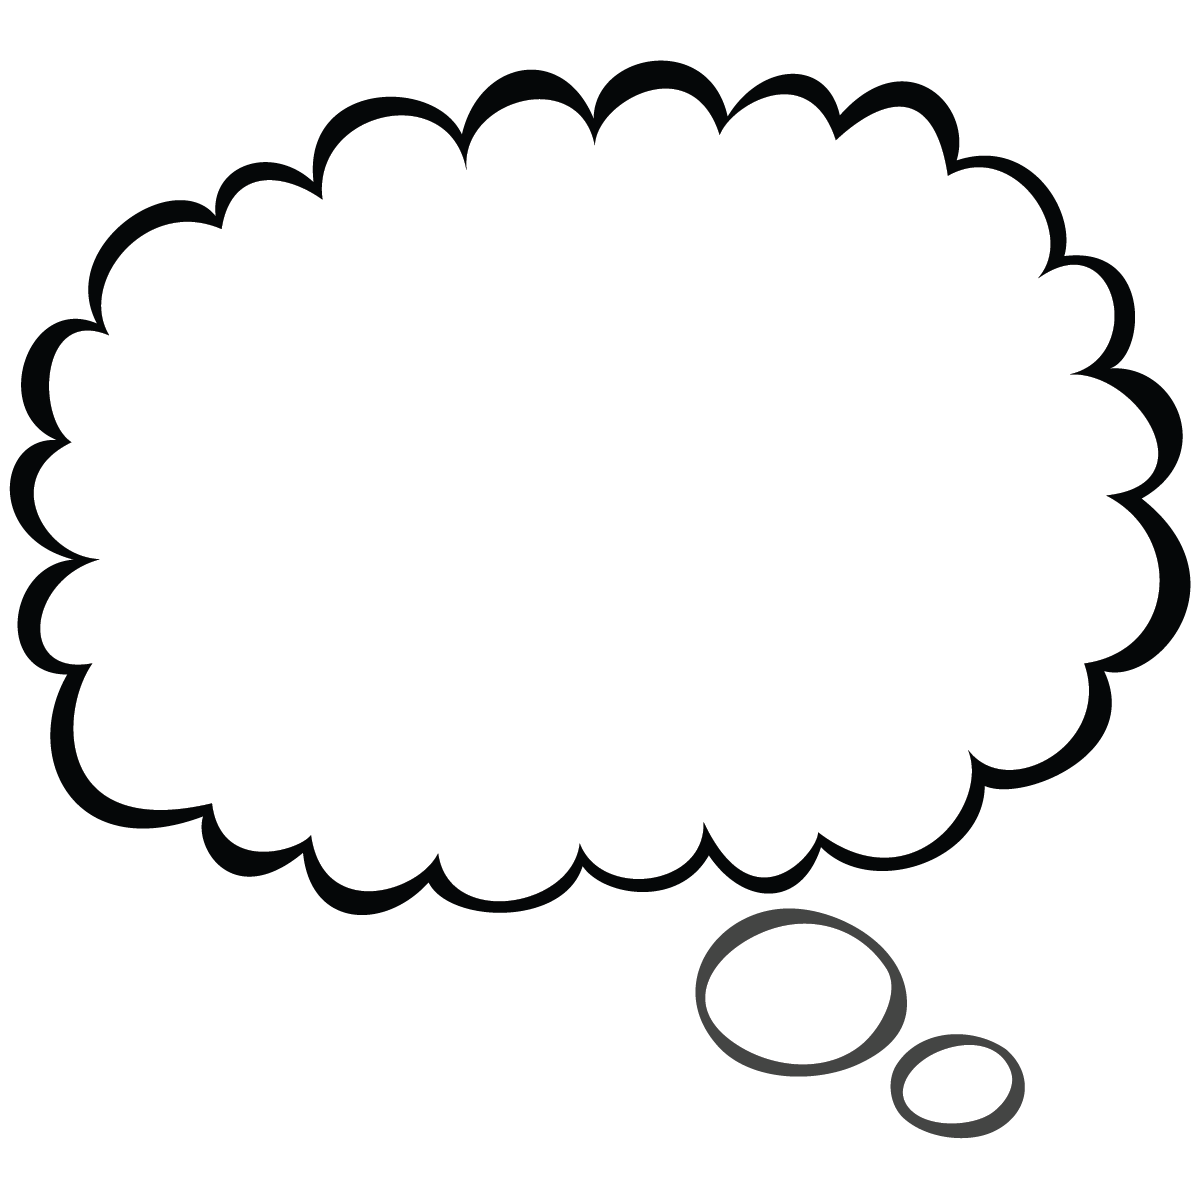 Cloud clipart thought bubble. Scal svg speech pinterest